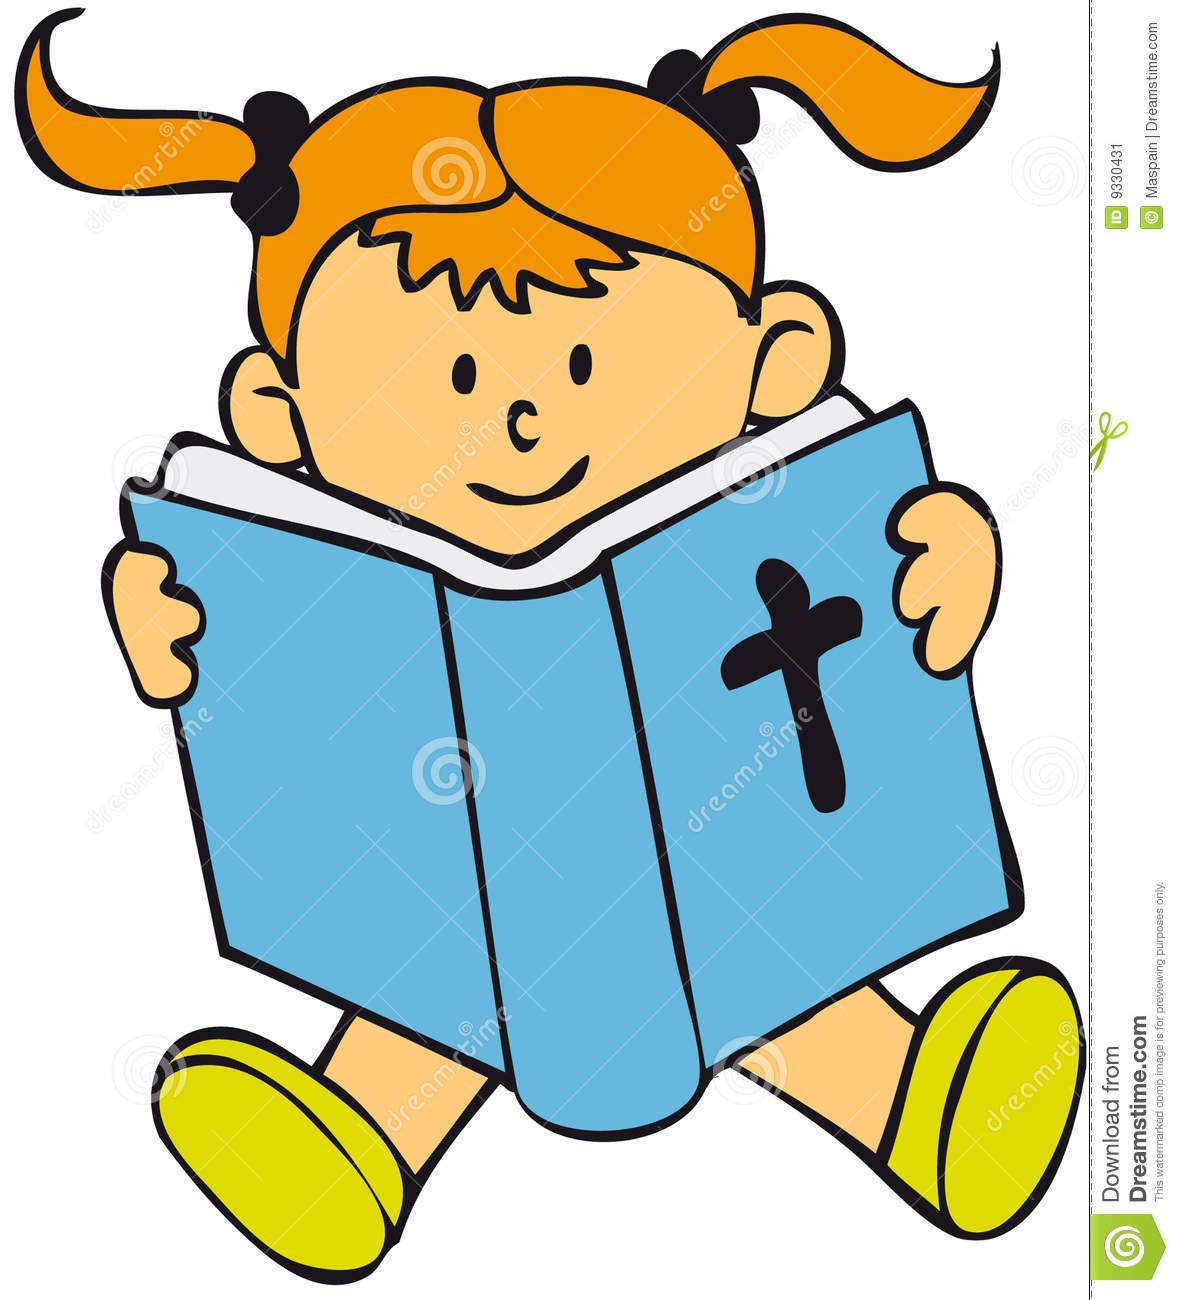 1179x1300 Bible Cute Clipart Free To Use Public Domain Clip Art